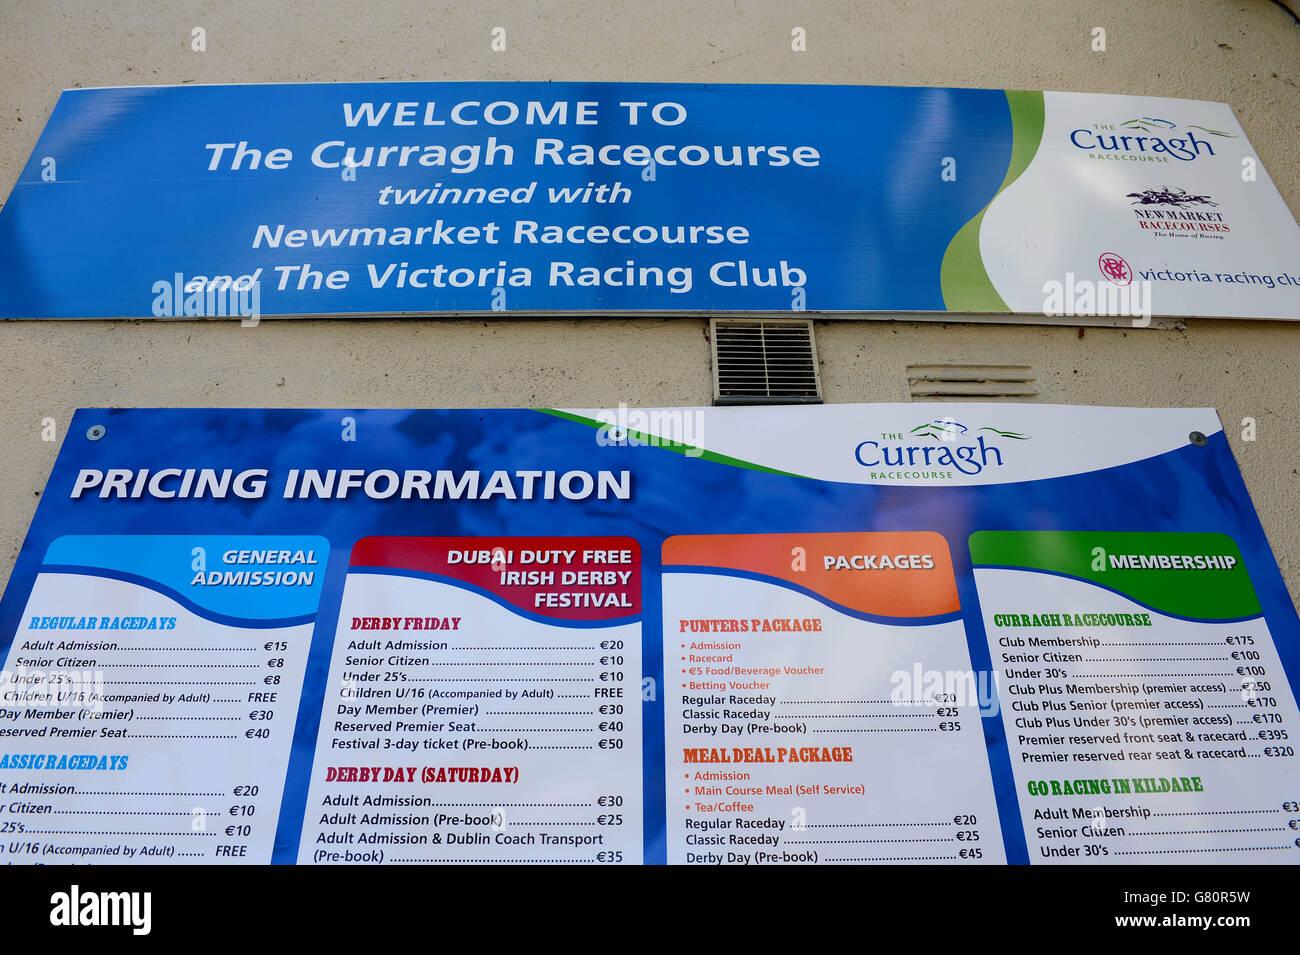 Dublin to Curragh Racecourse - 7 ways to travel via train, taxi